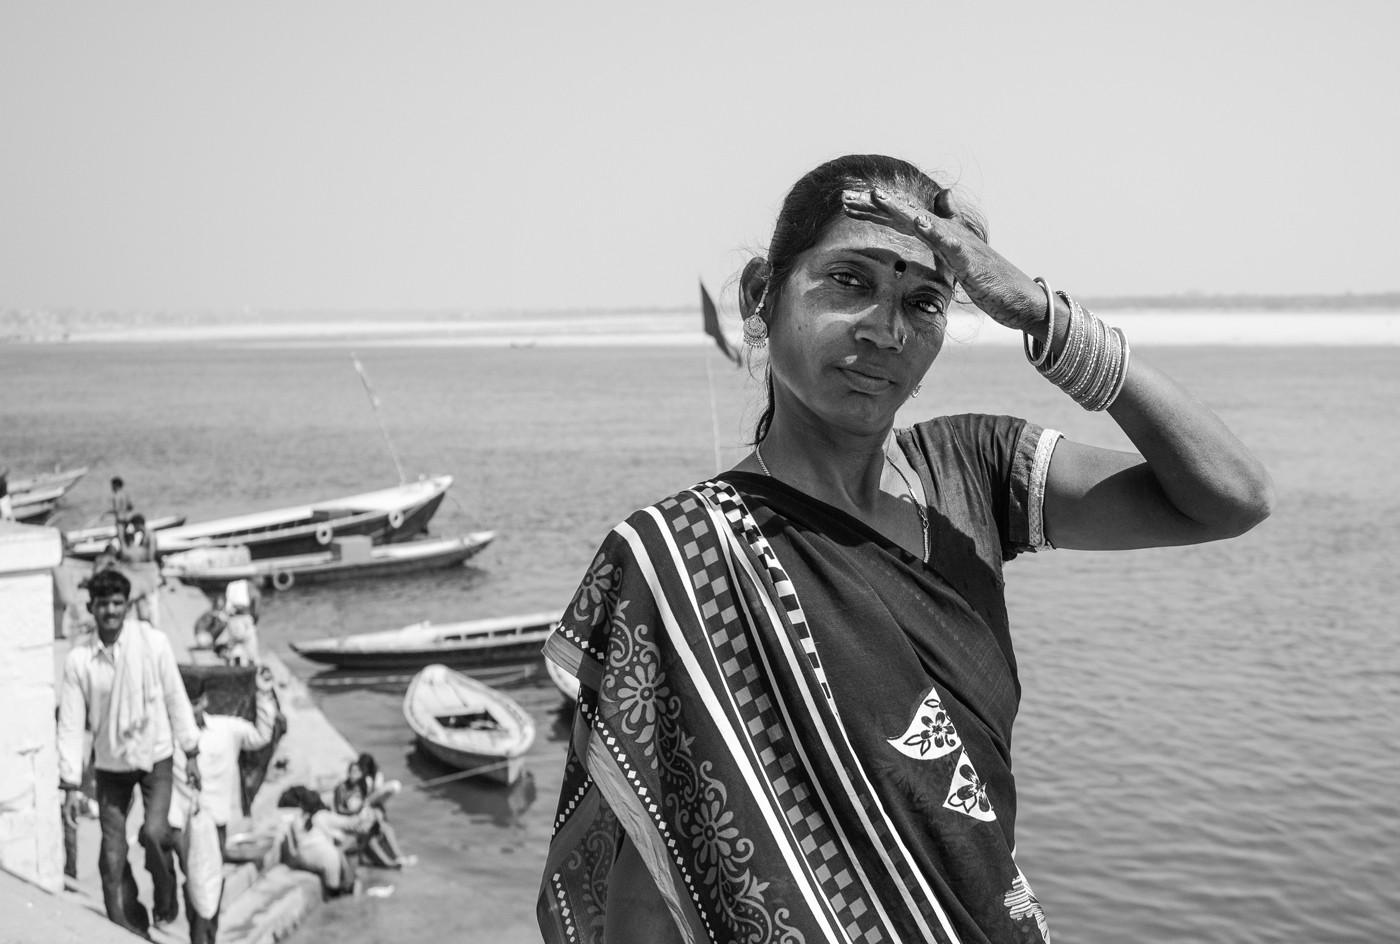 Retrato Documental Mujer Varanasi - Woman Portrait - India